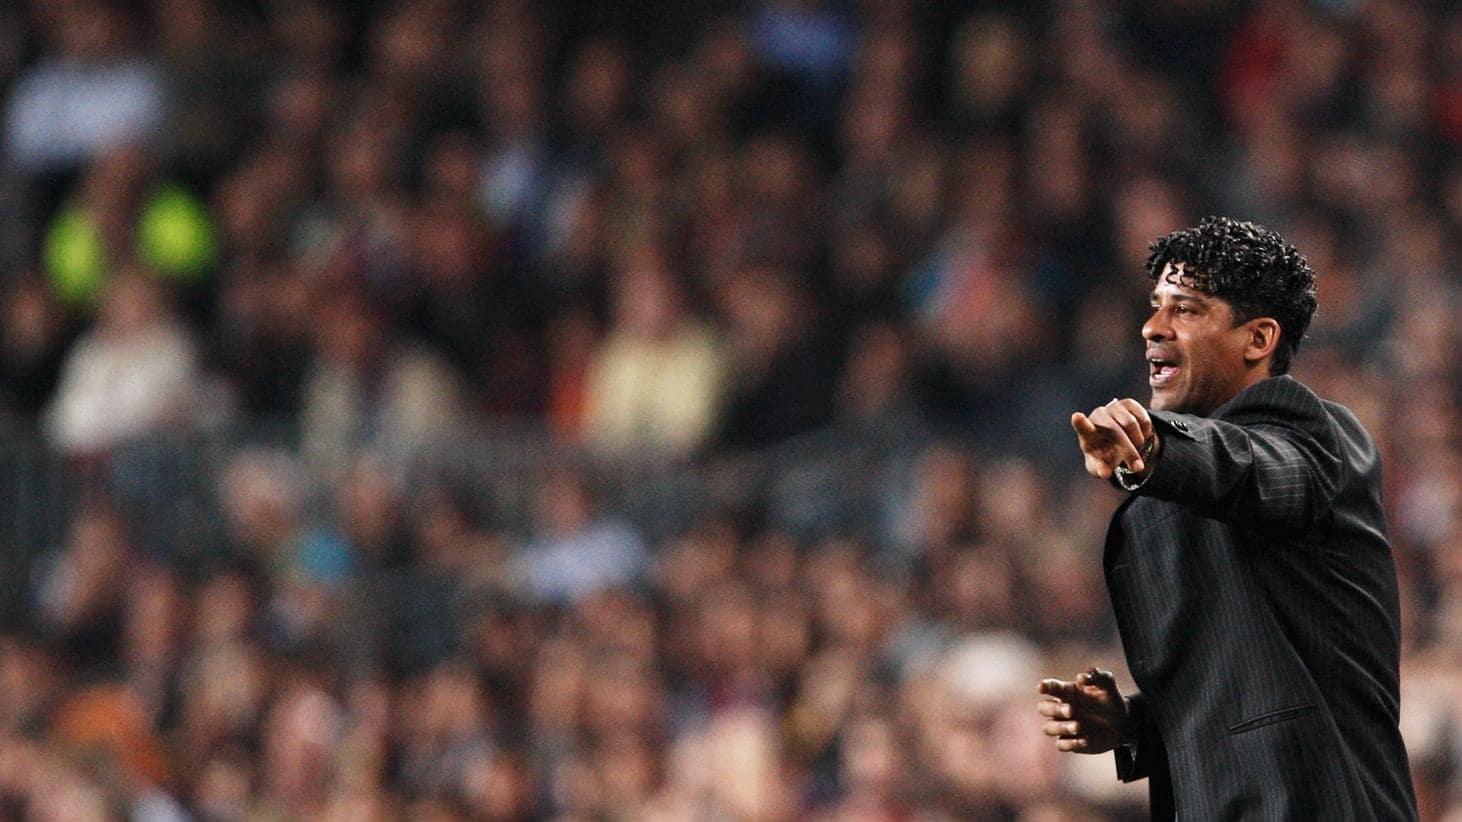 Rijkaard The FC Barcelona coach